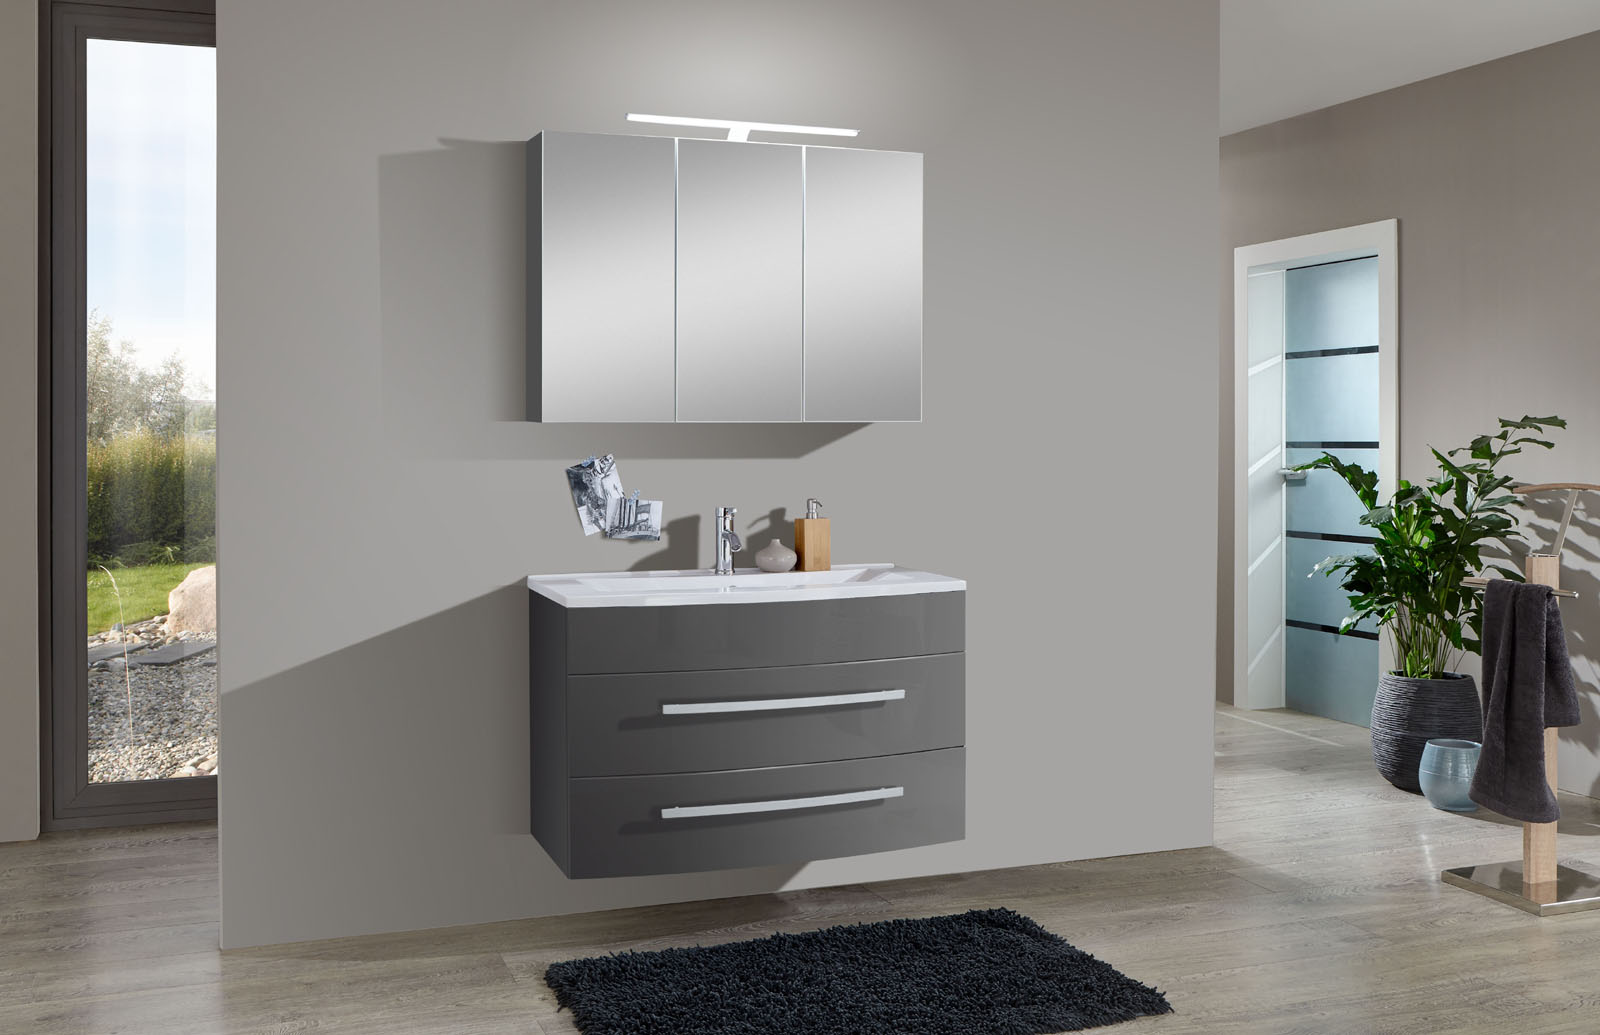 SAM® 2tlg Badezimmer Set Hochglanz Grau 90 Cm Genf Auf Lager !